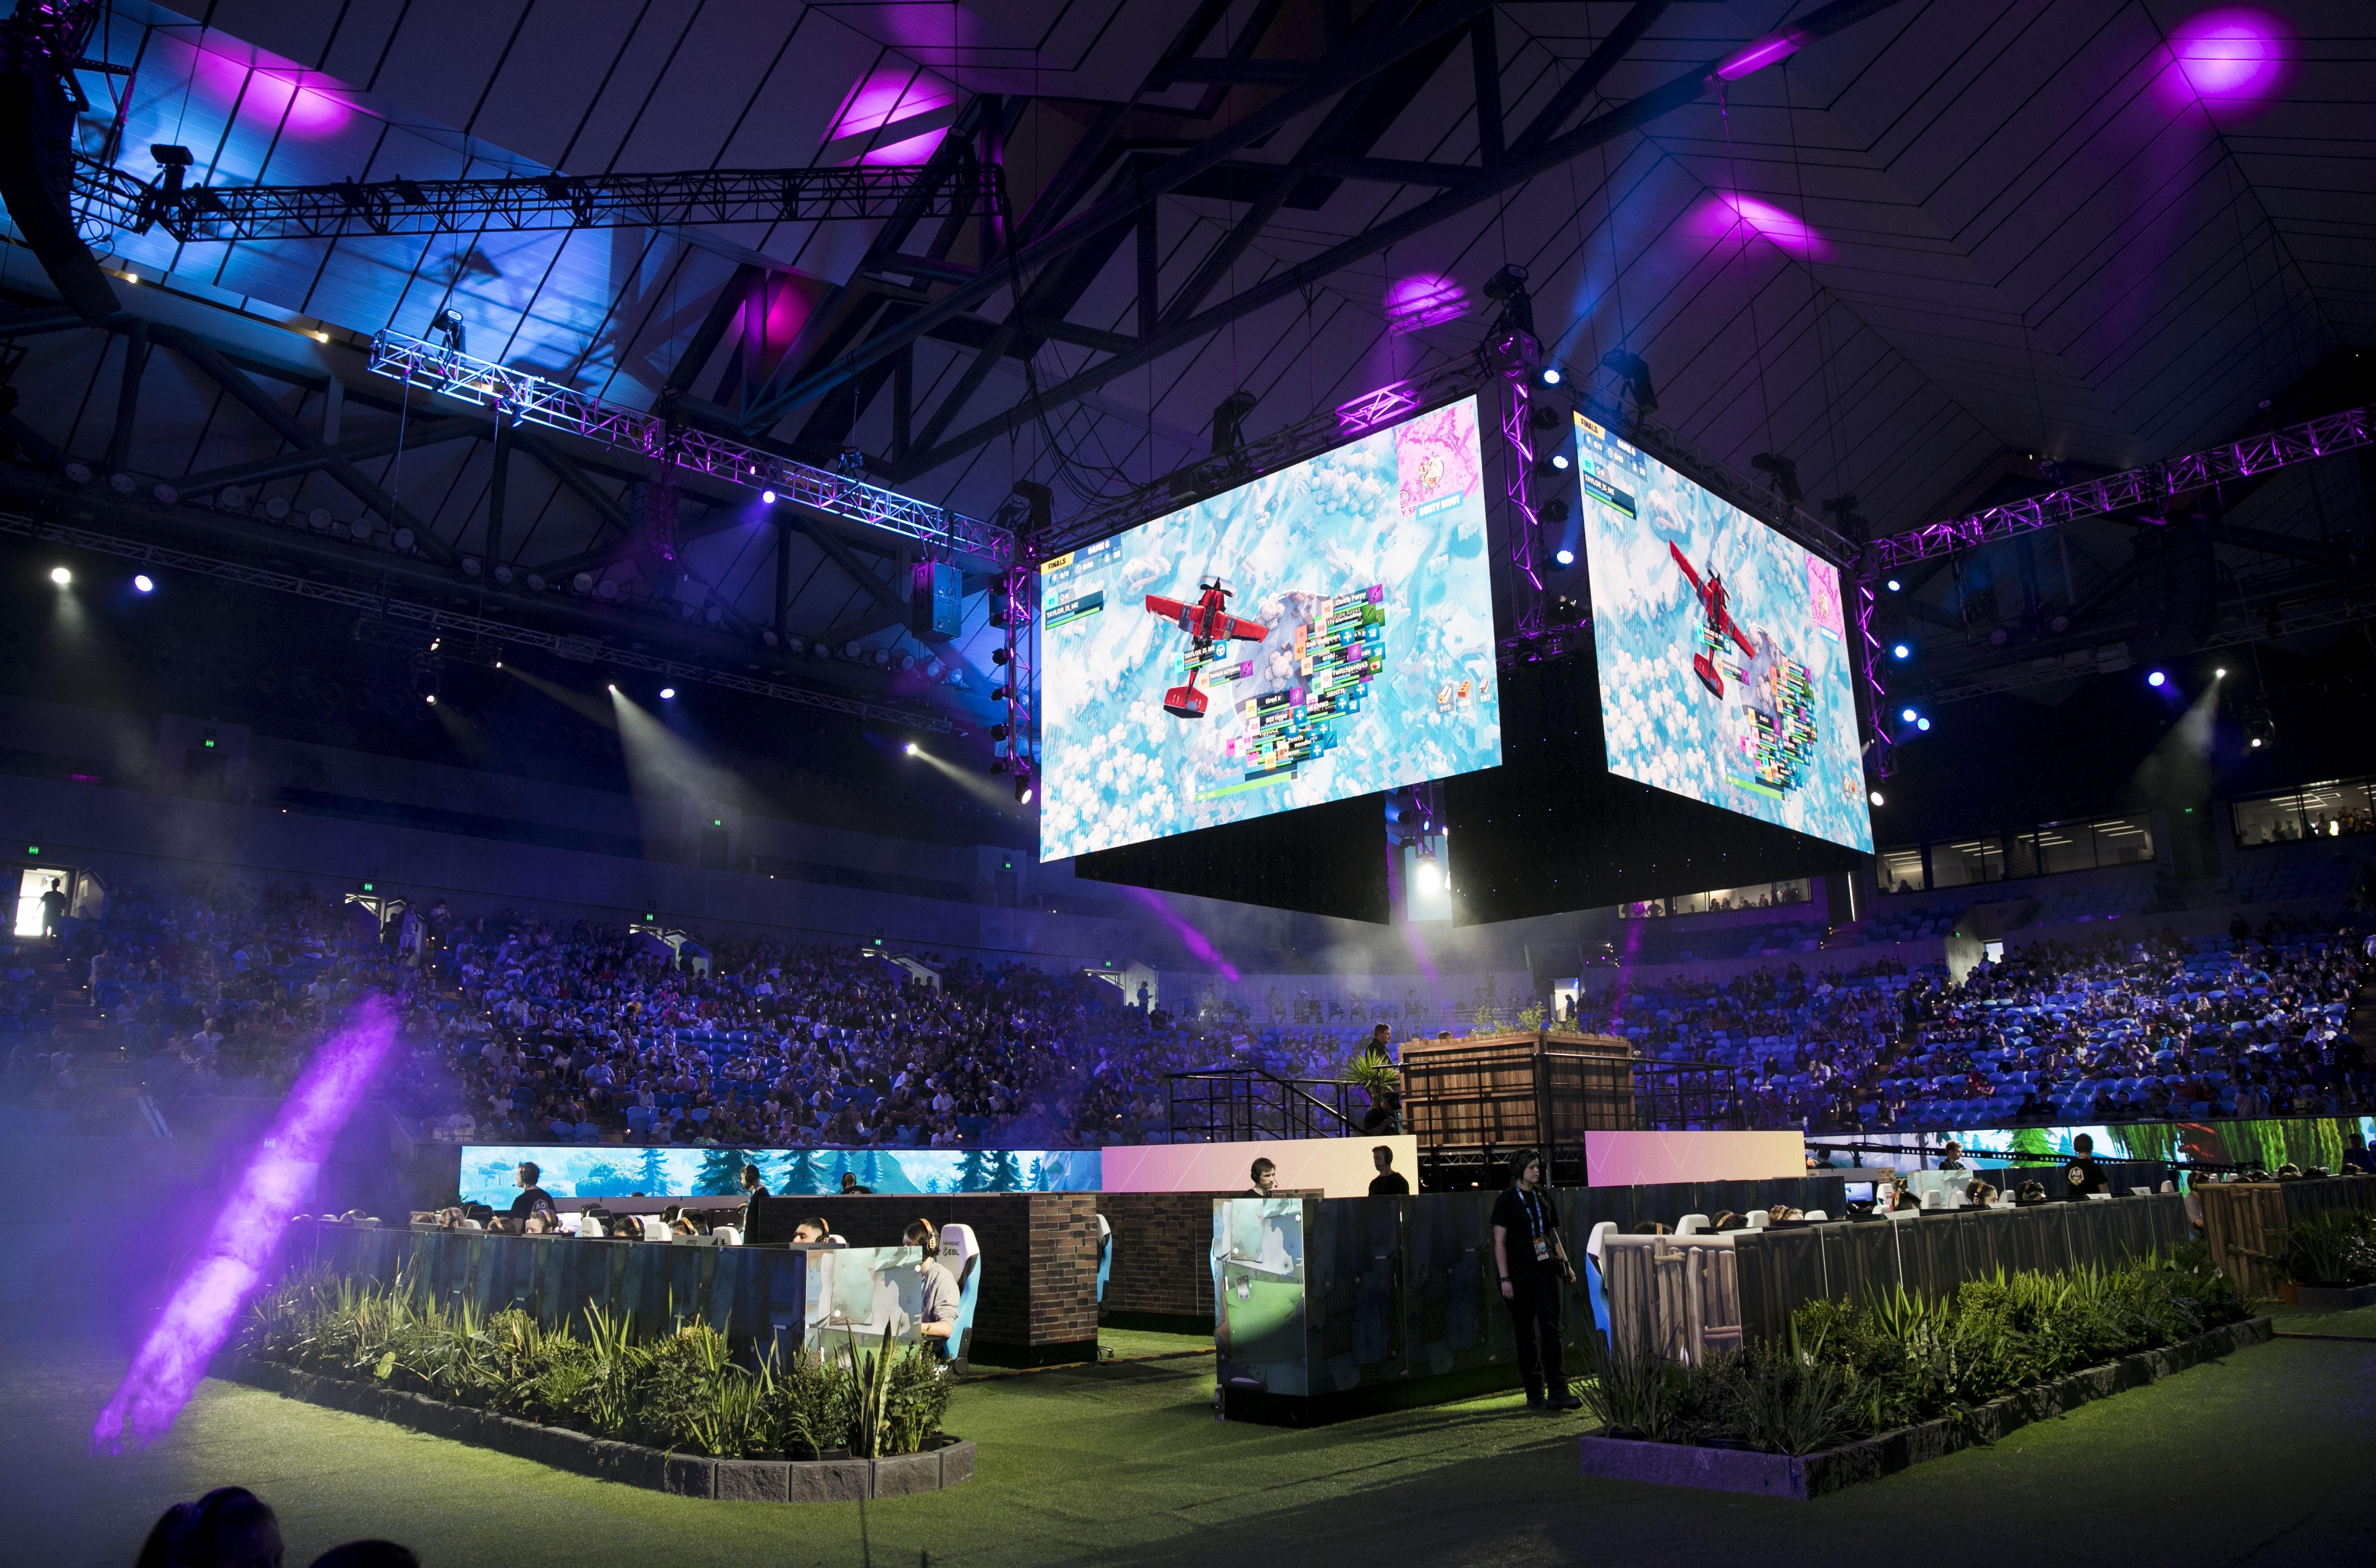 fortnite summer smashed australian open event was a hit - esports arena fortnite